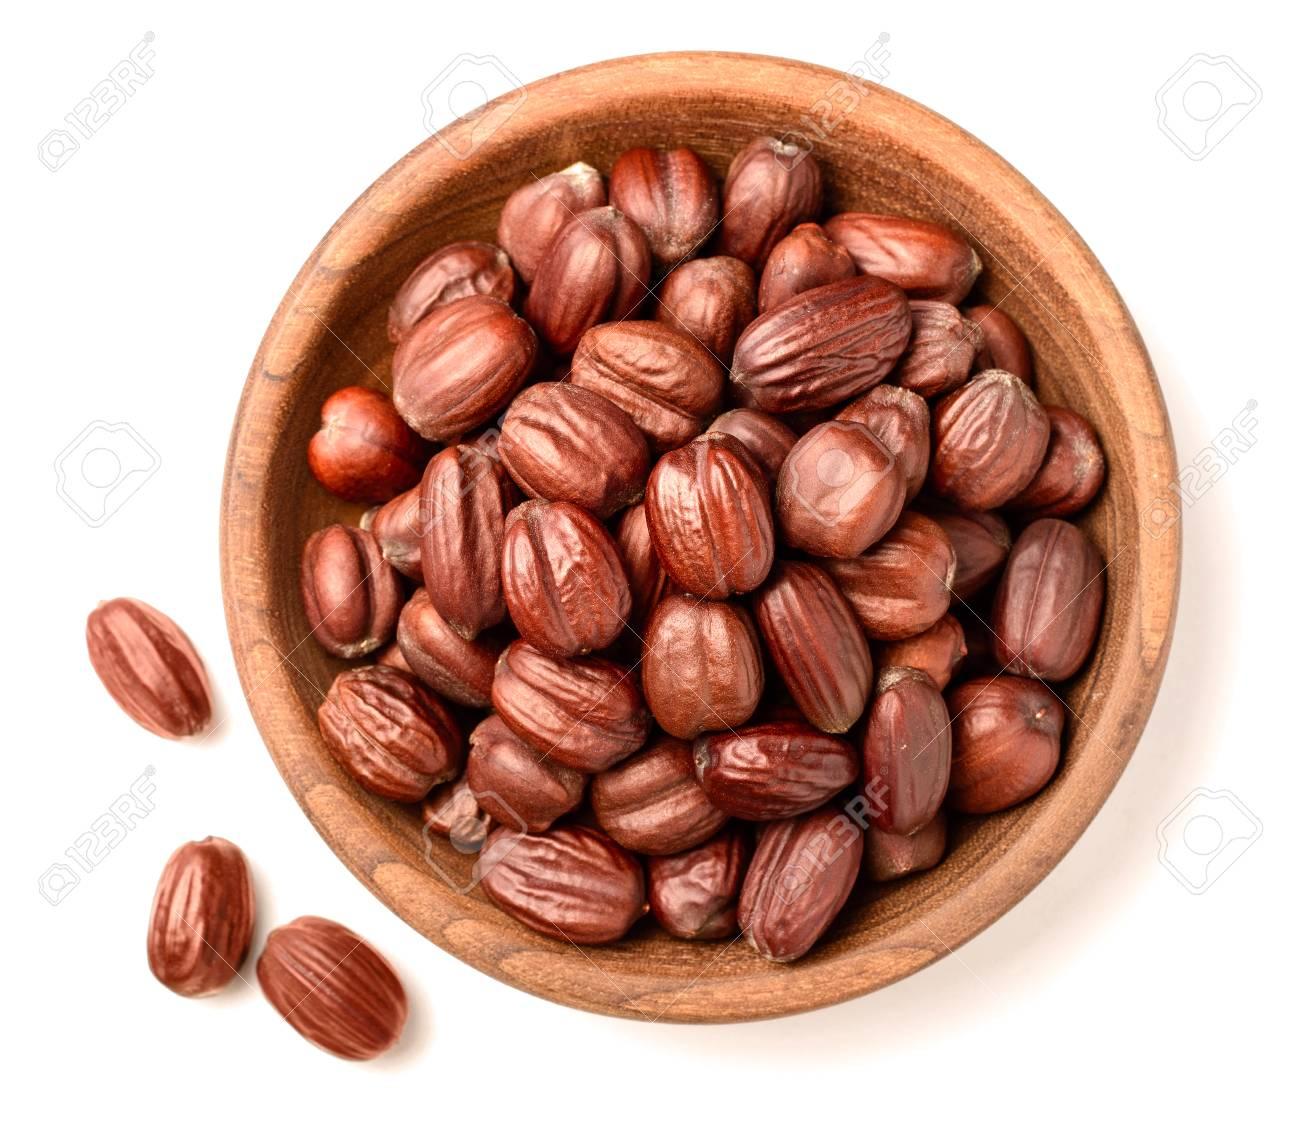 dried jojoba seeds isolated on white - 87751317